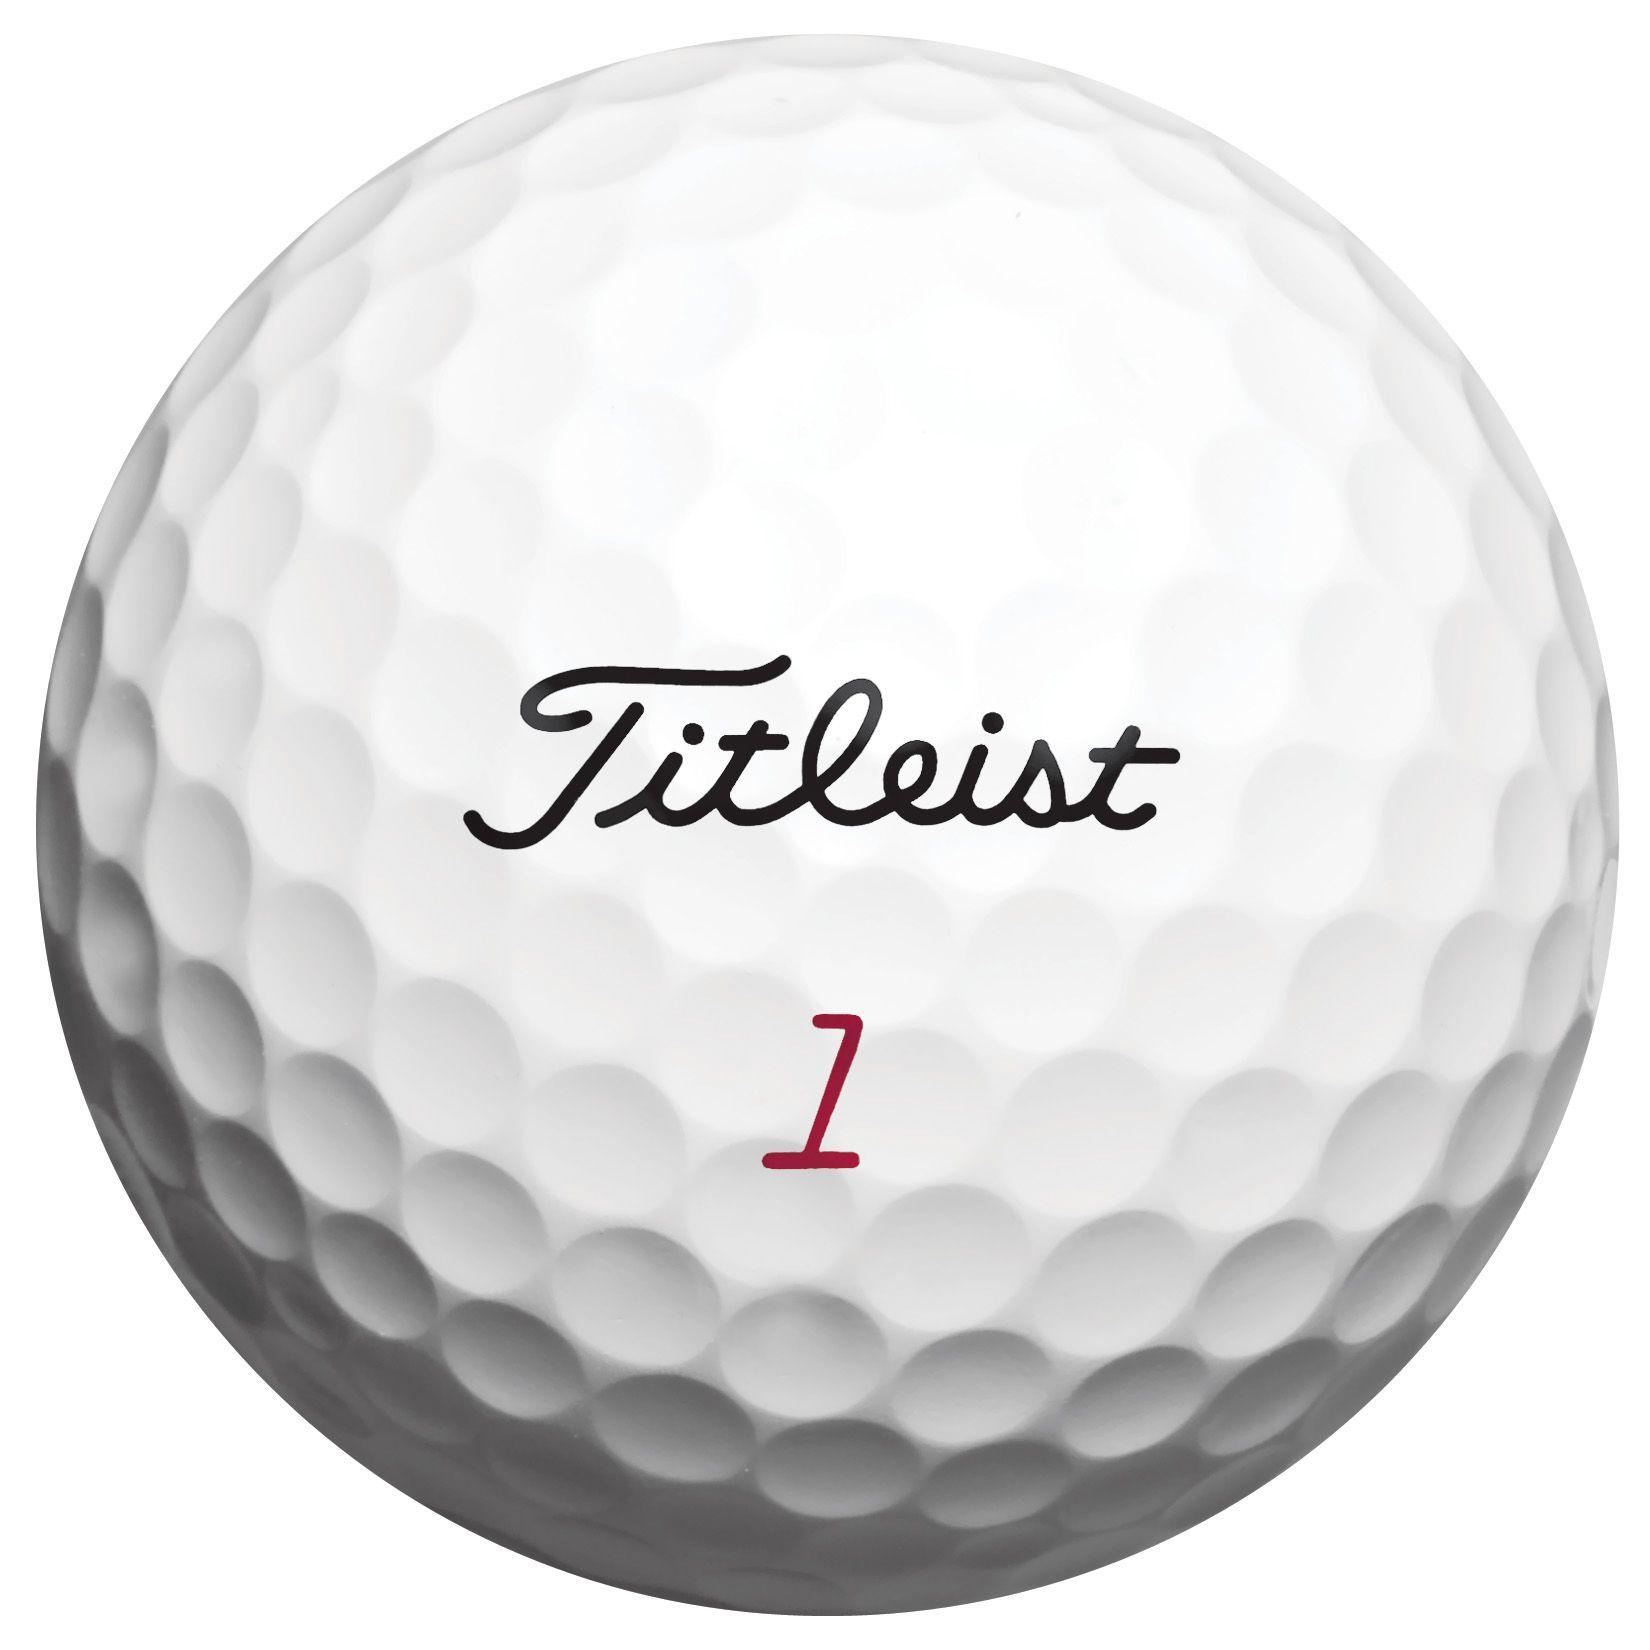 Titleist Pro V1x Many Pros Use This Brand Golf Ball Titleist Golf Golf Gear